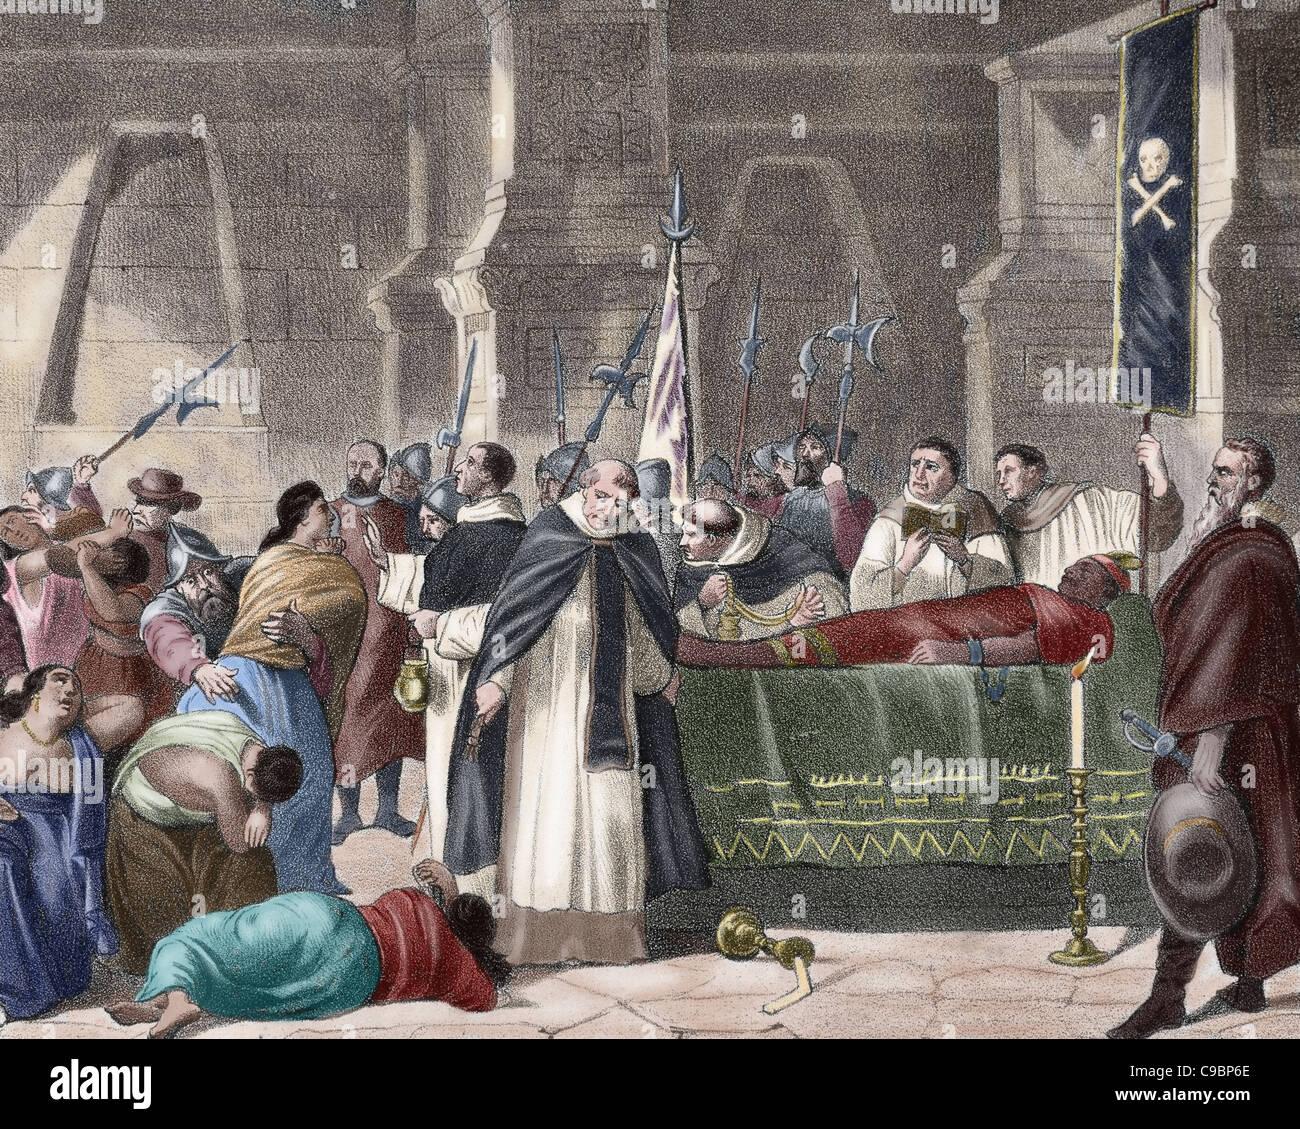 Atahualpa (1497-1533). Last Sapa Inca. Death of Atahualpa. Funeral. Colored engraving. - Stock Image